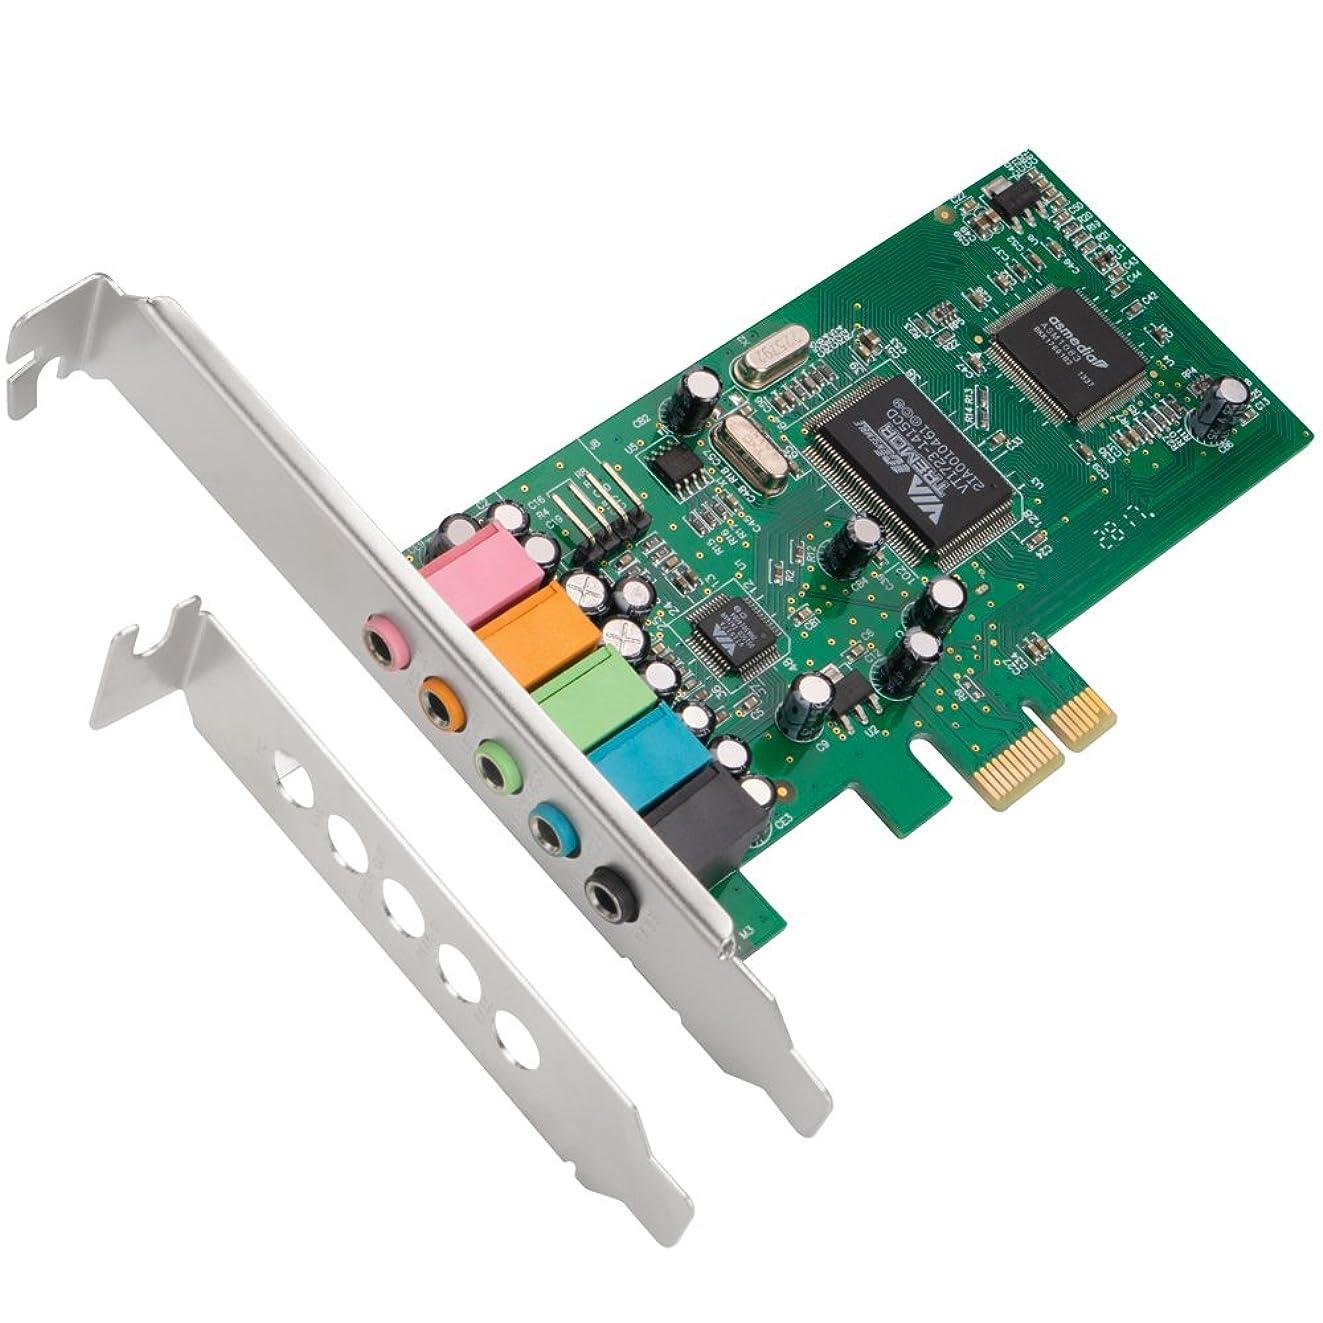 QNINE PCIe Sound Card for PC Windows 10, PCI Express Desktop Sound Adapter with Low Profile Bracket, 3D Stereo PCI-e Audio Card, VIA 1723 Chip 32/64 Bit Sound Card for Windows XP / 7/8